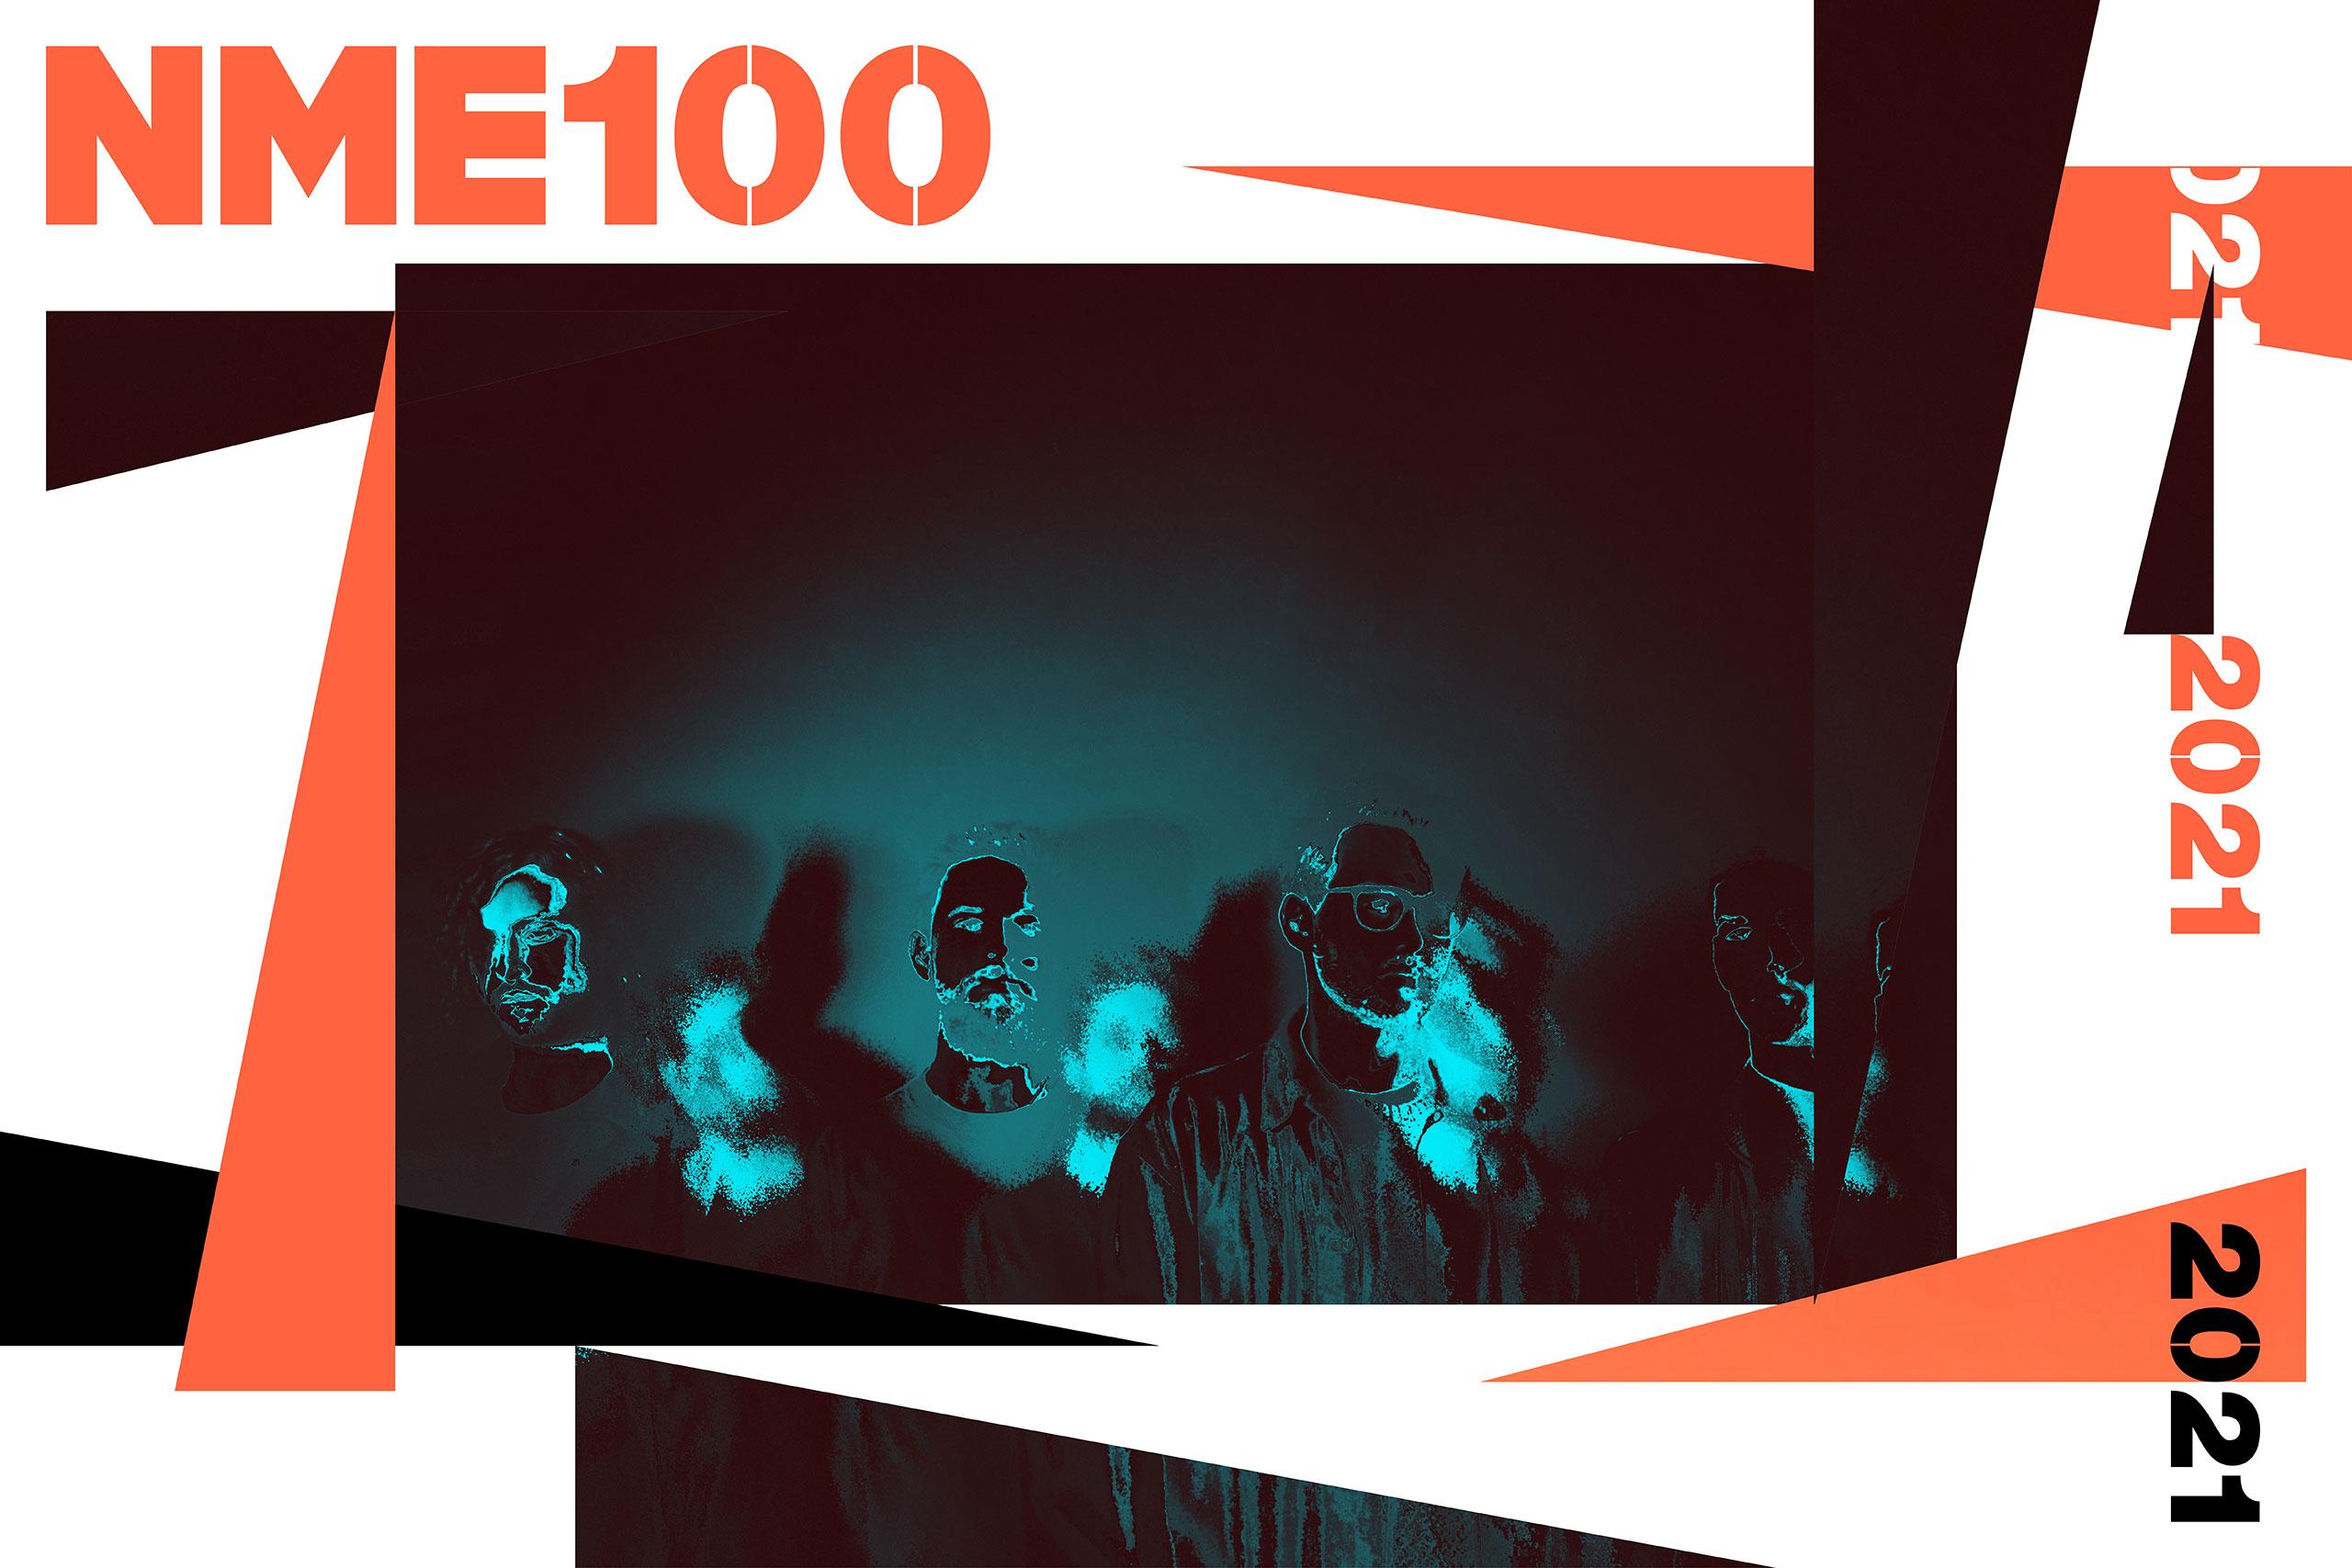 NME 100 scalping